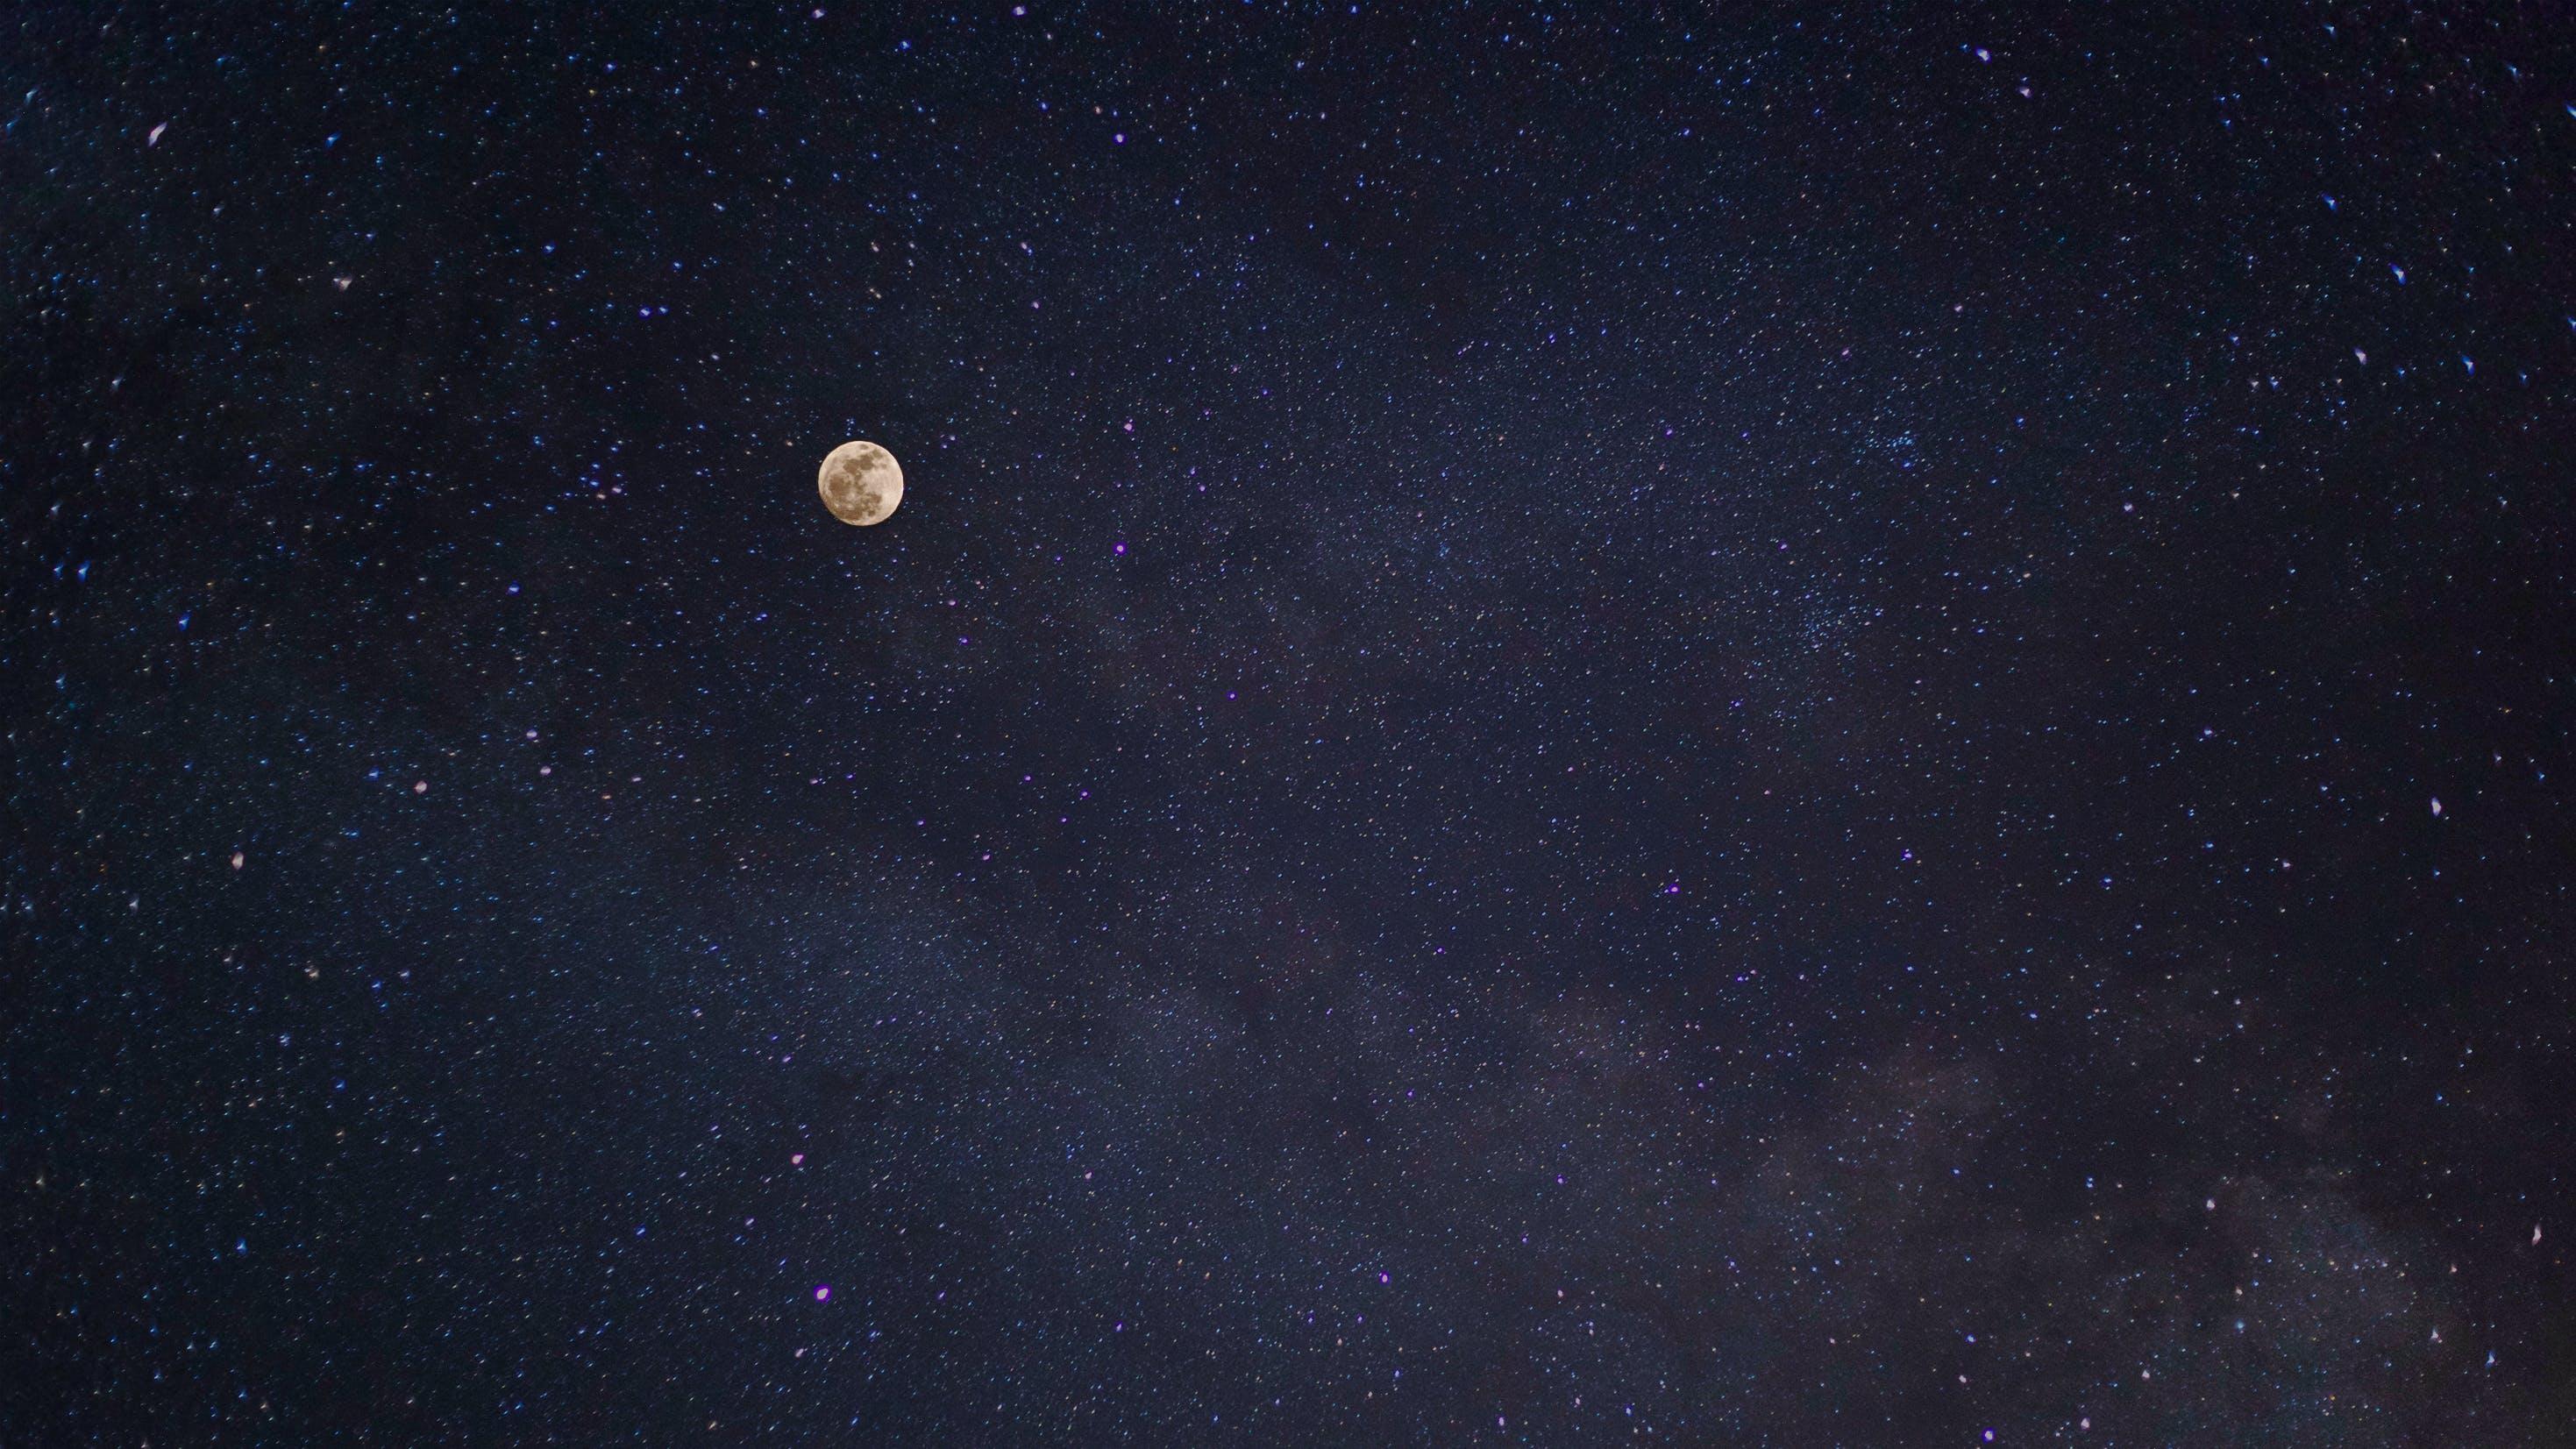 astrologie, astronomie, galaxie